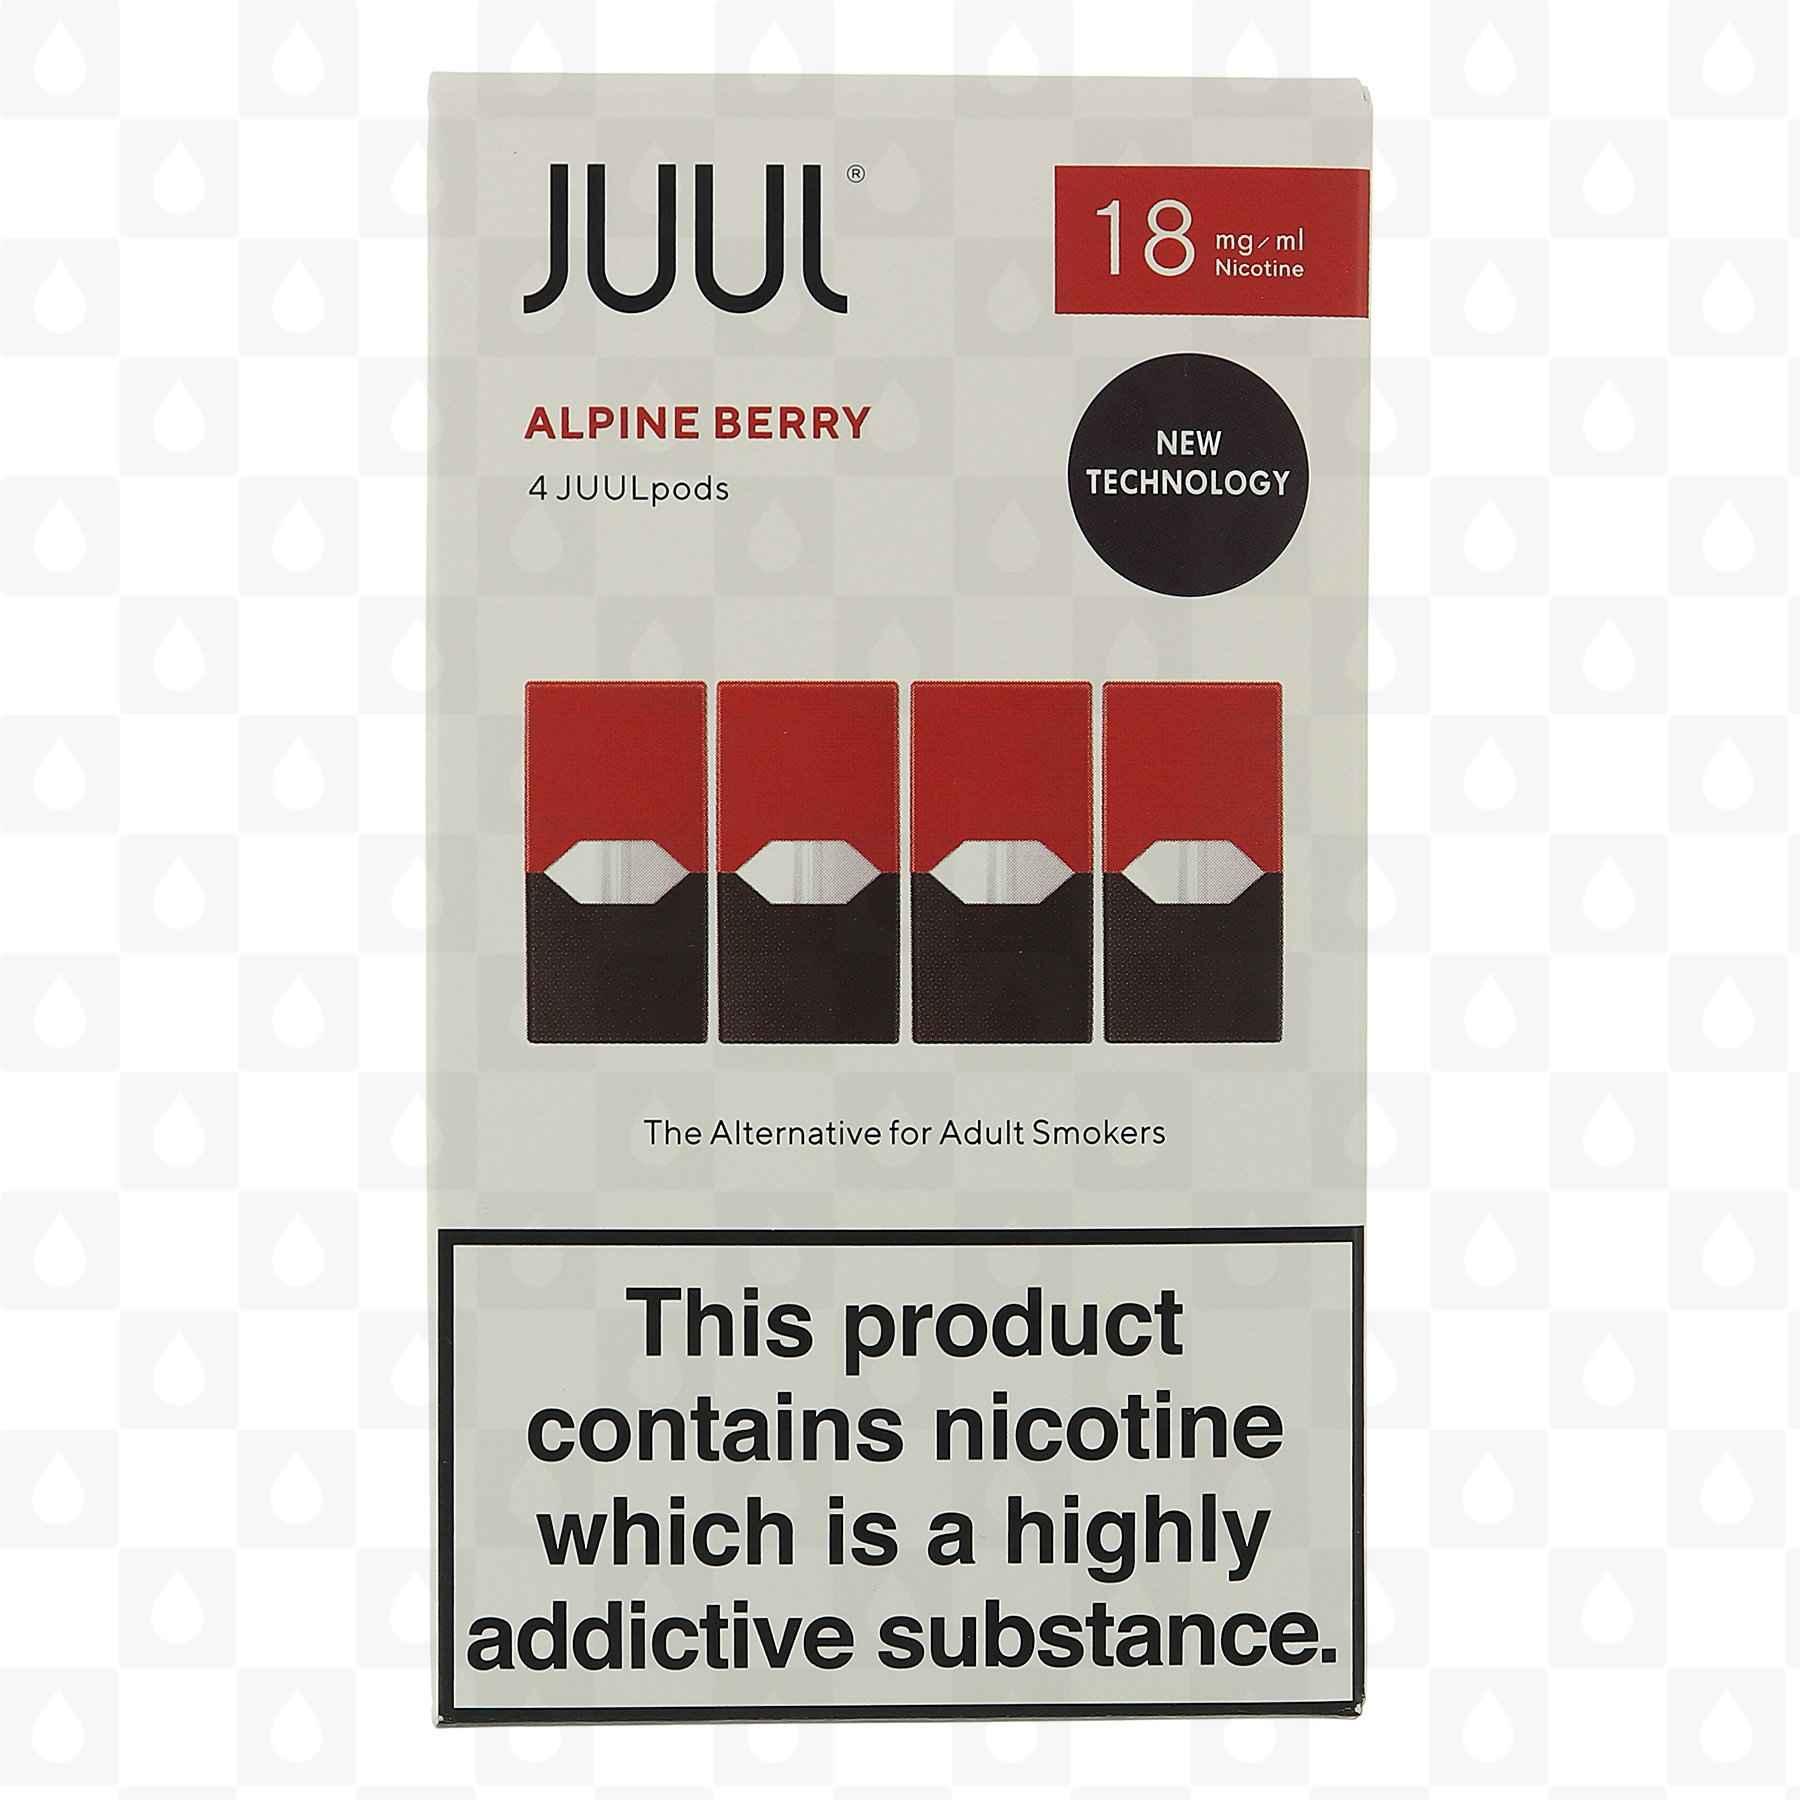 JUUL Alpine Berry Replacement Pods